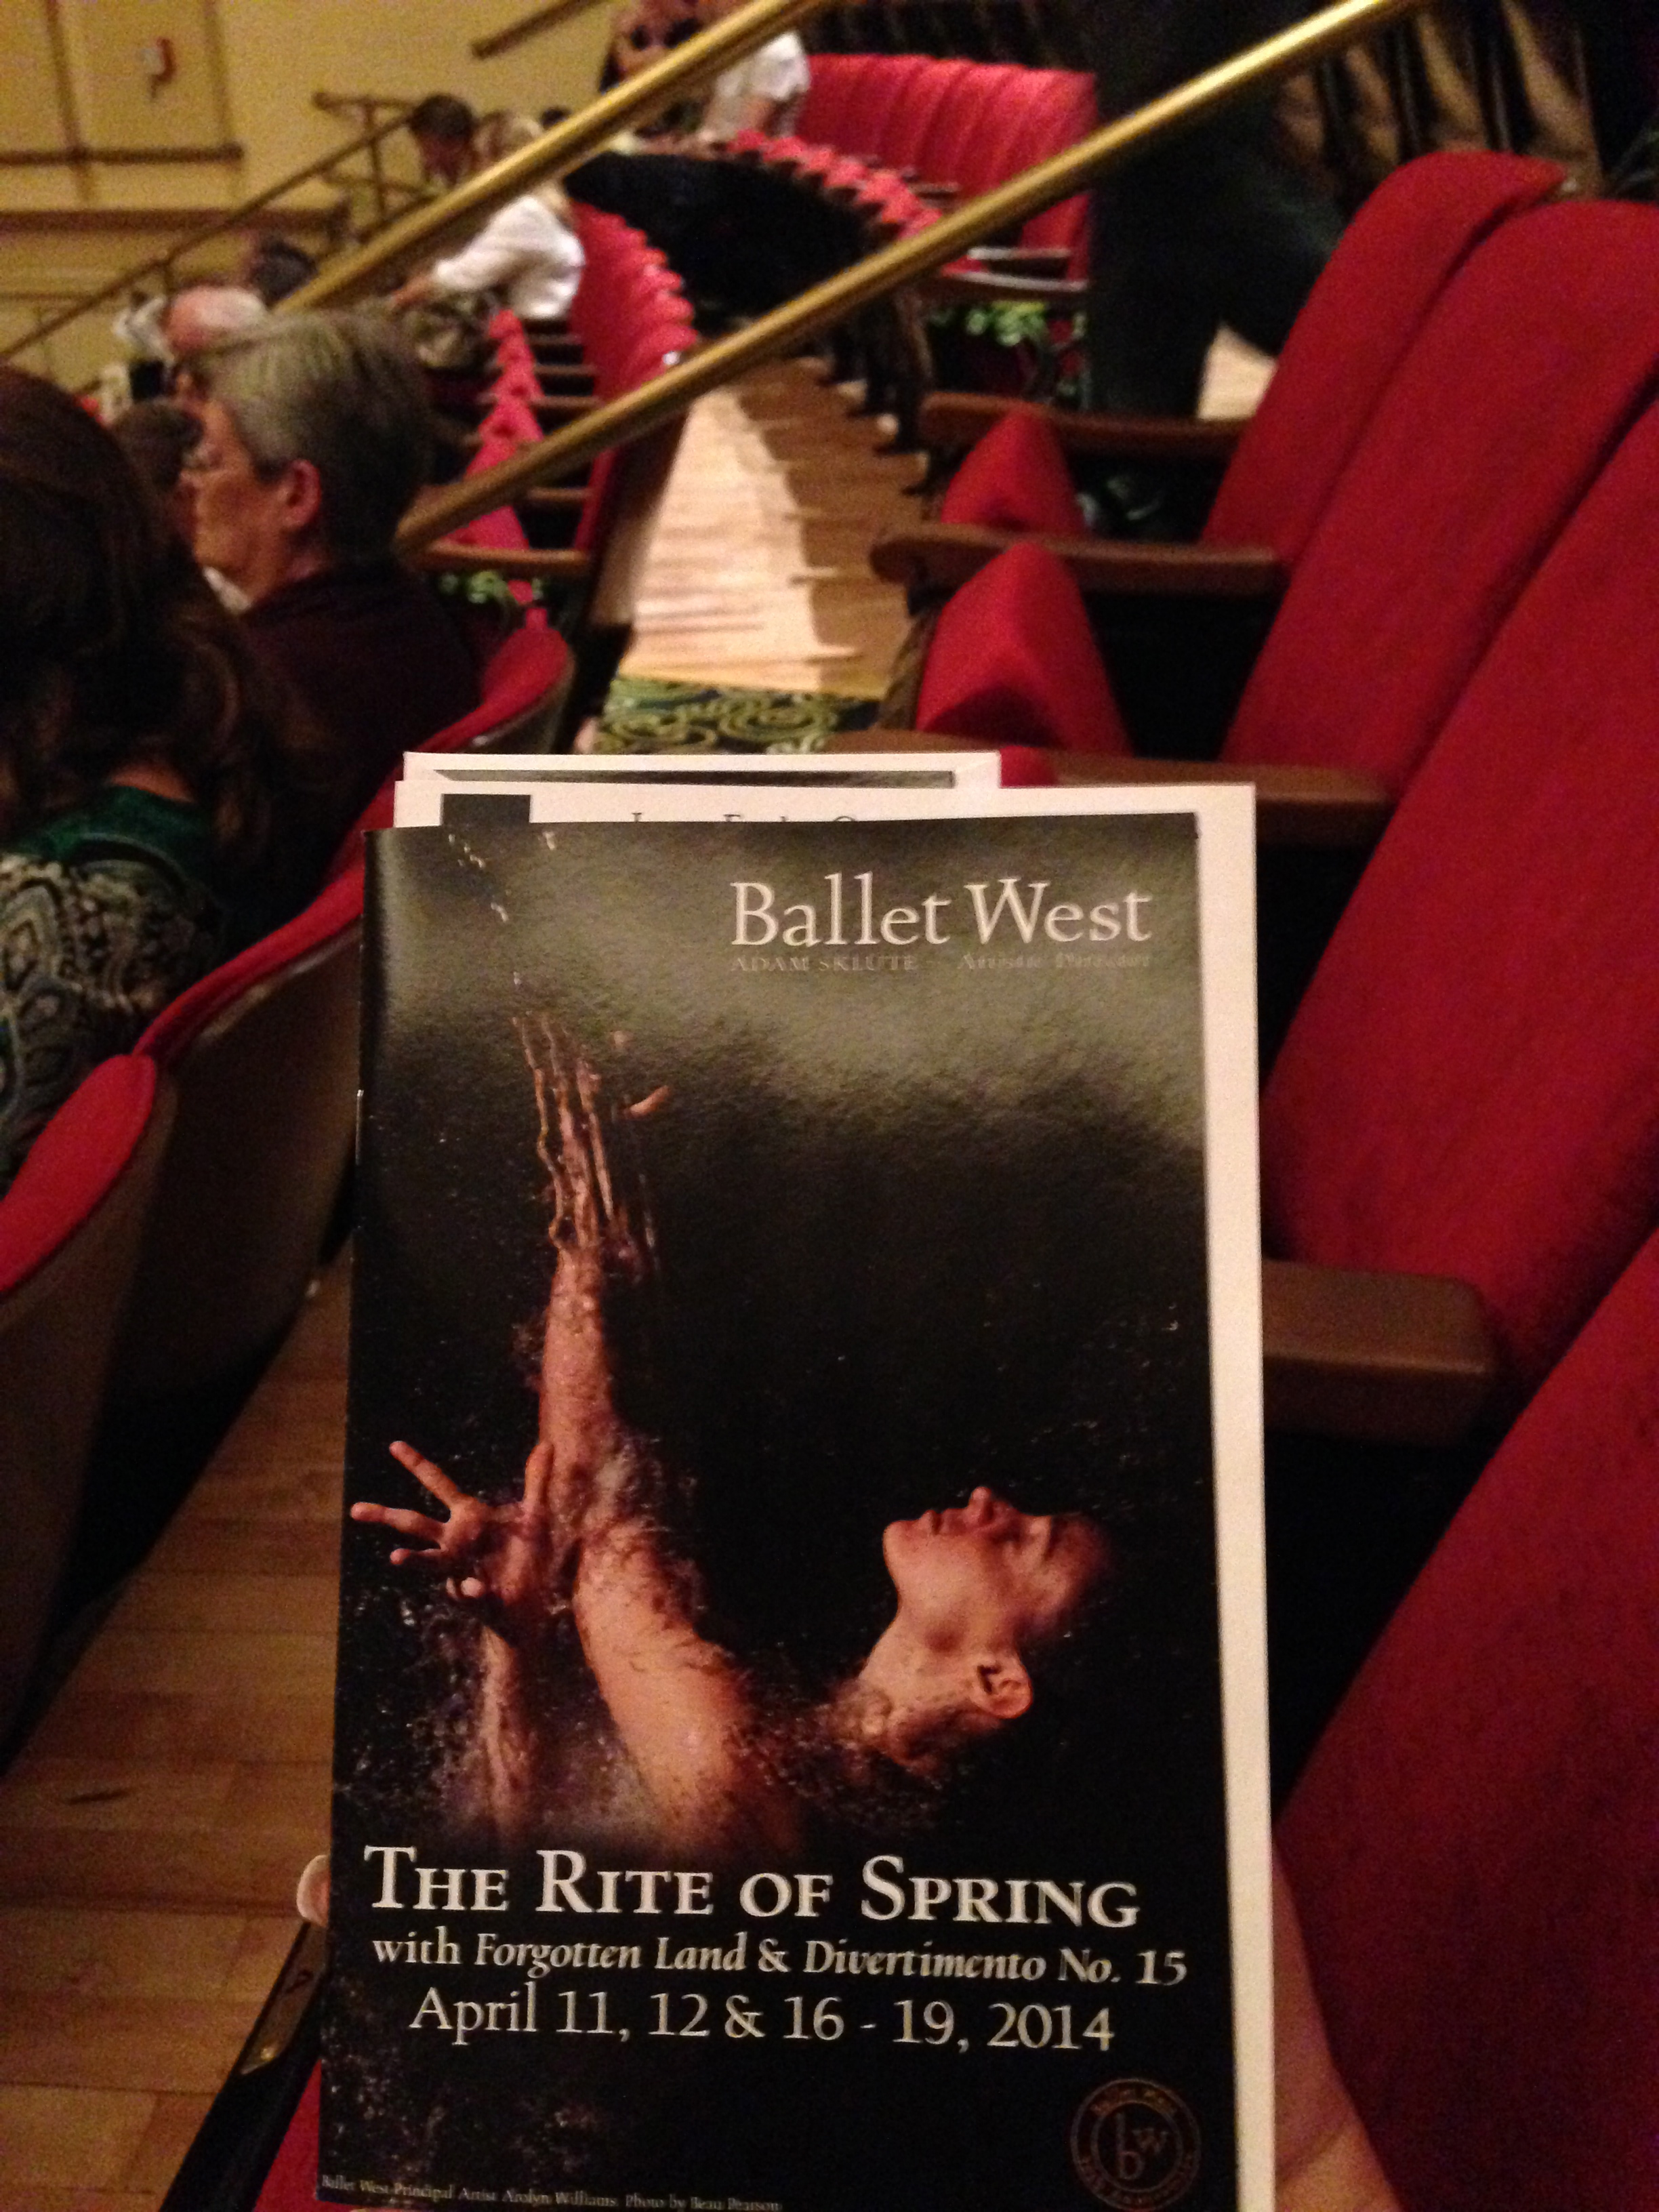 Beckanne Sisk and Chase OConnell | Ballet performances